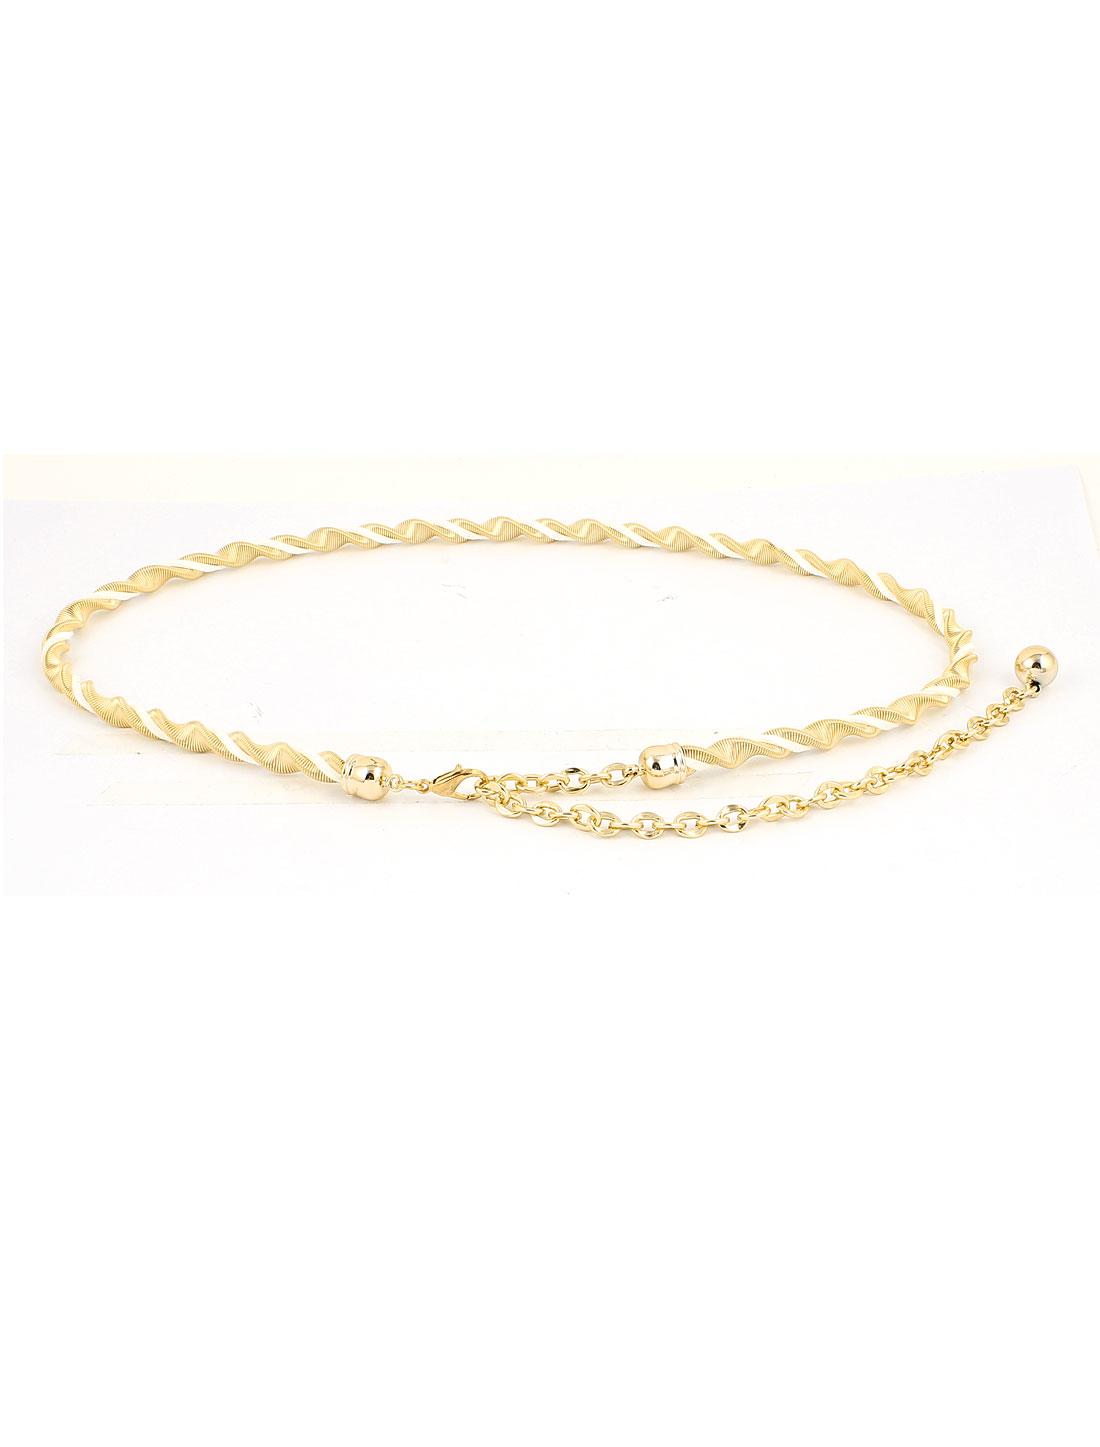 Ladies Women Lobster Clasp Metallic Waist Belt Gold Tone